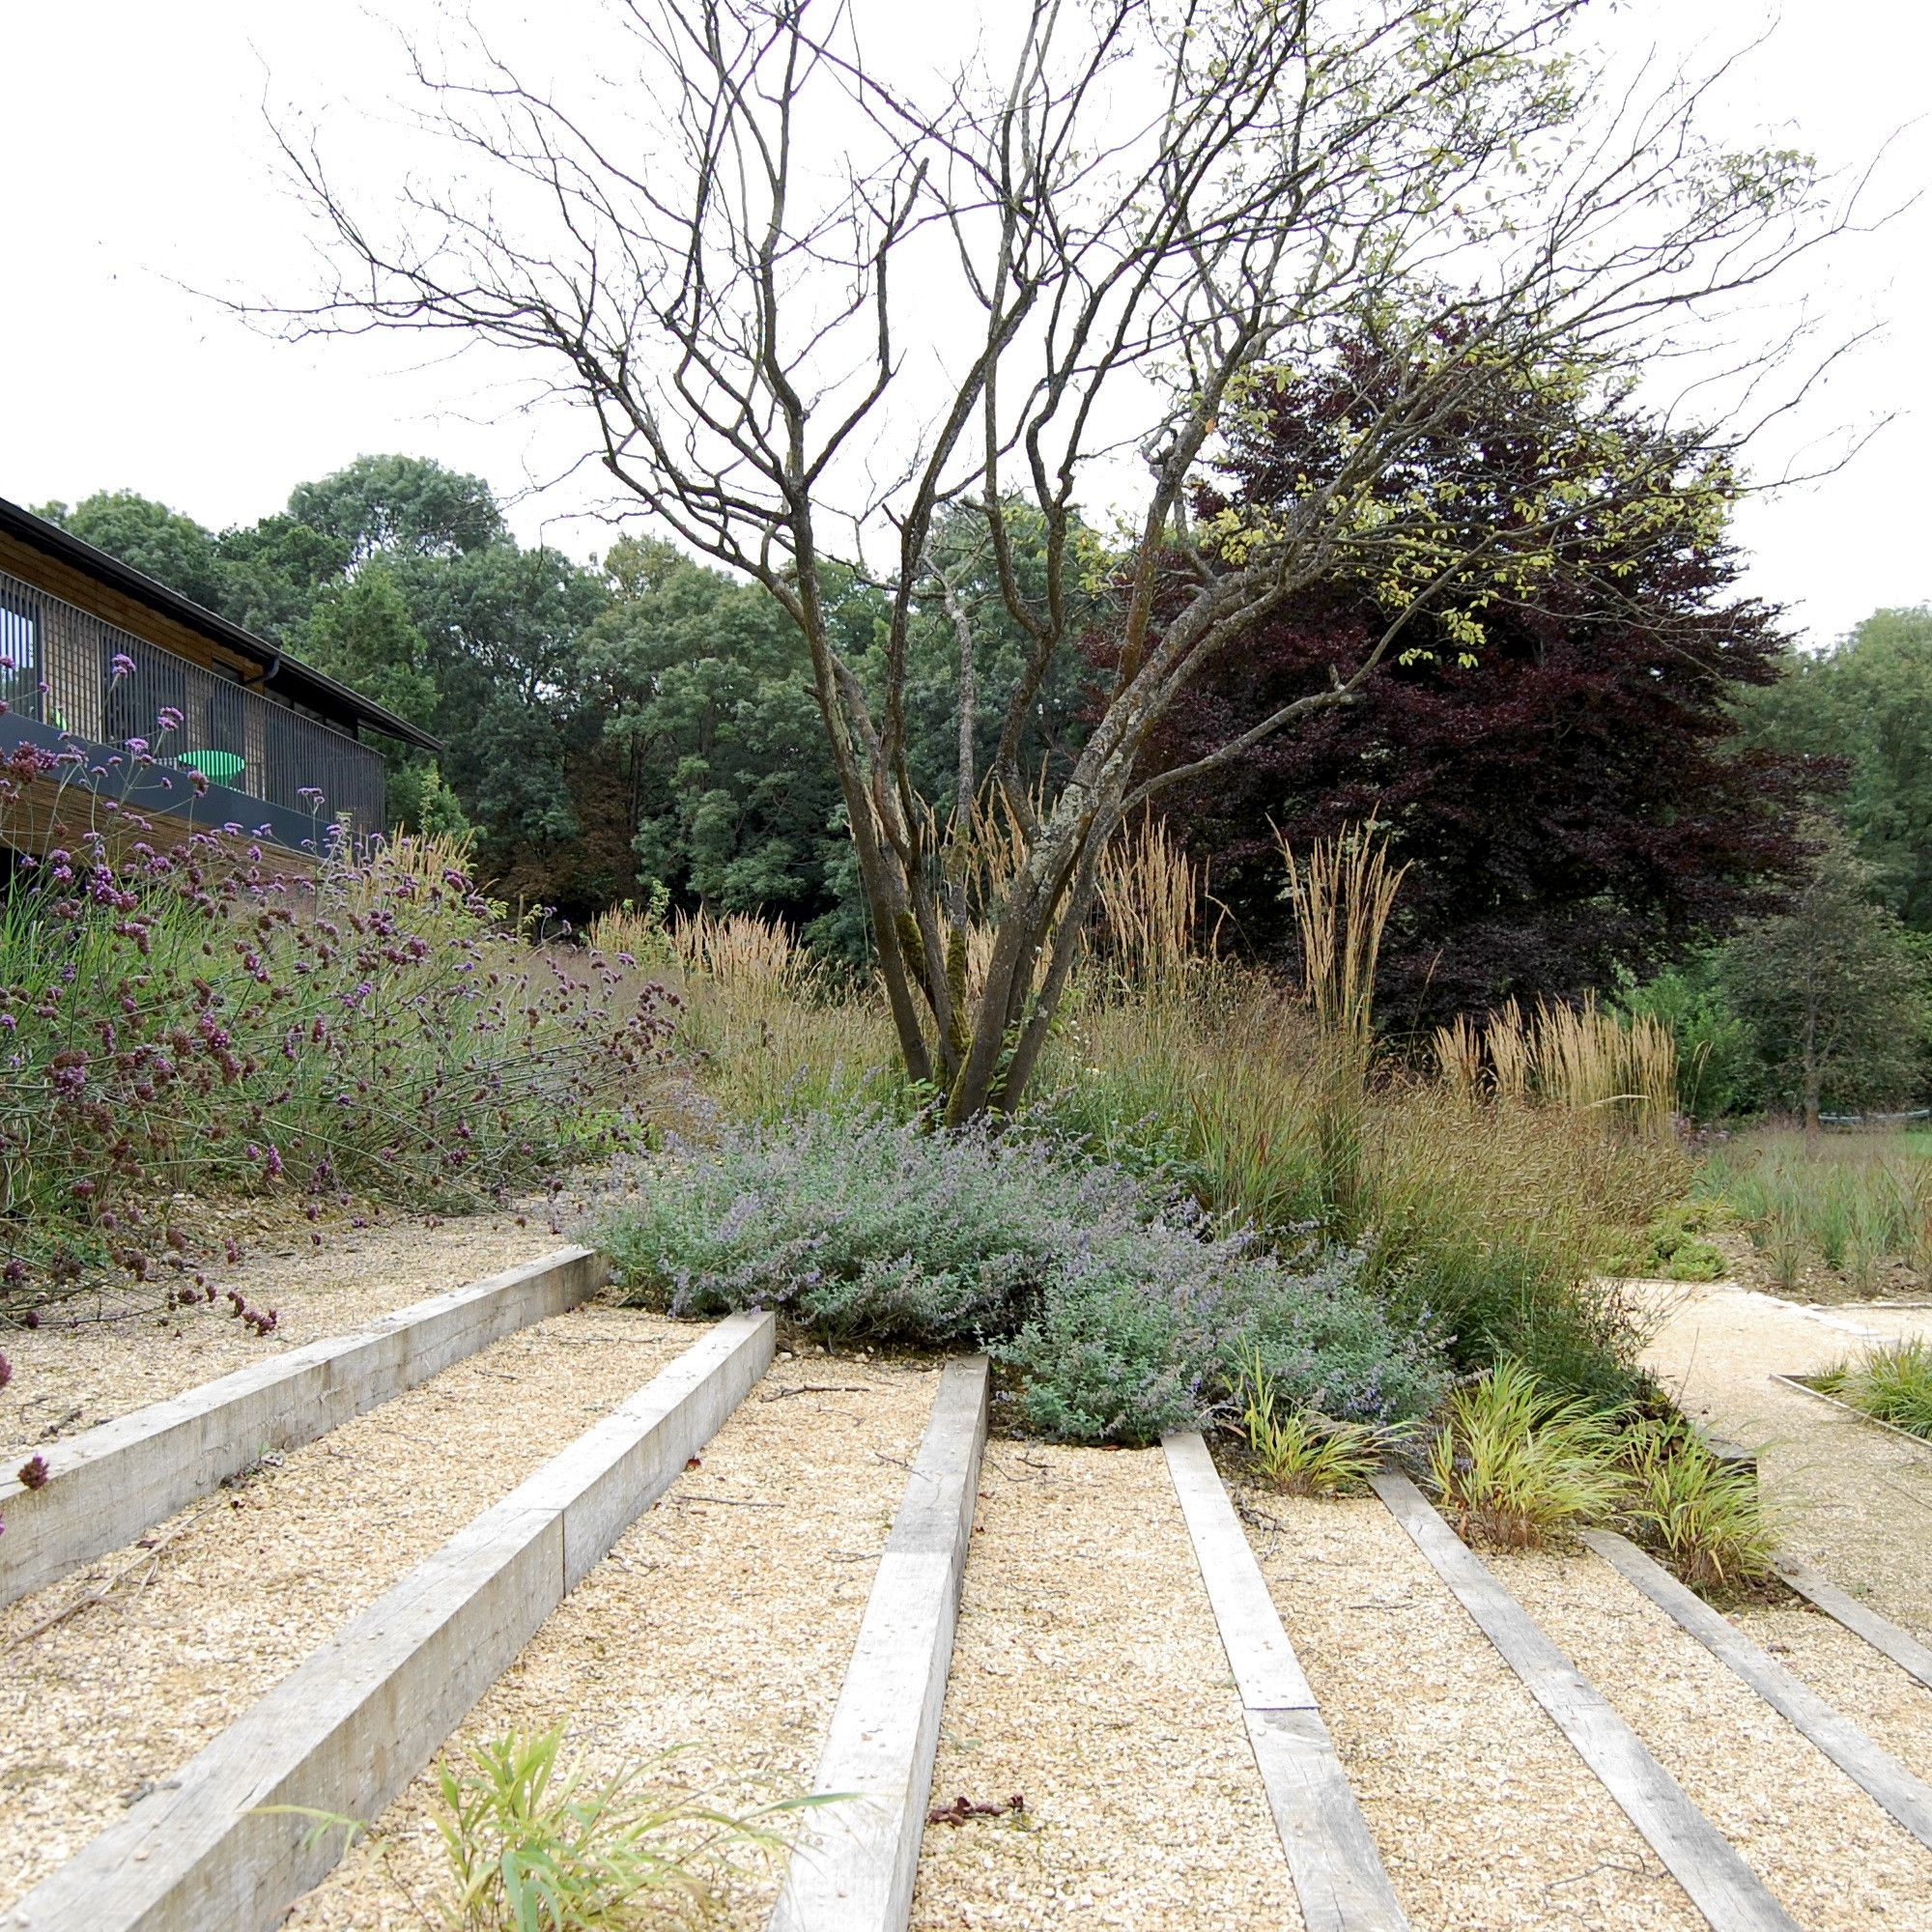 Nicholas dexter studio jardines pinterest paisajismo for Paisajismo jardines rusticos